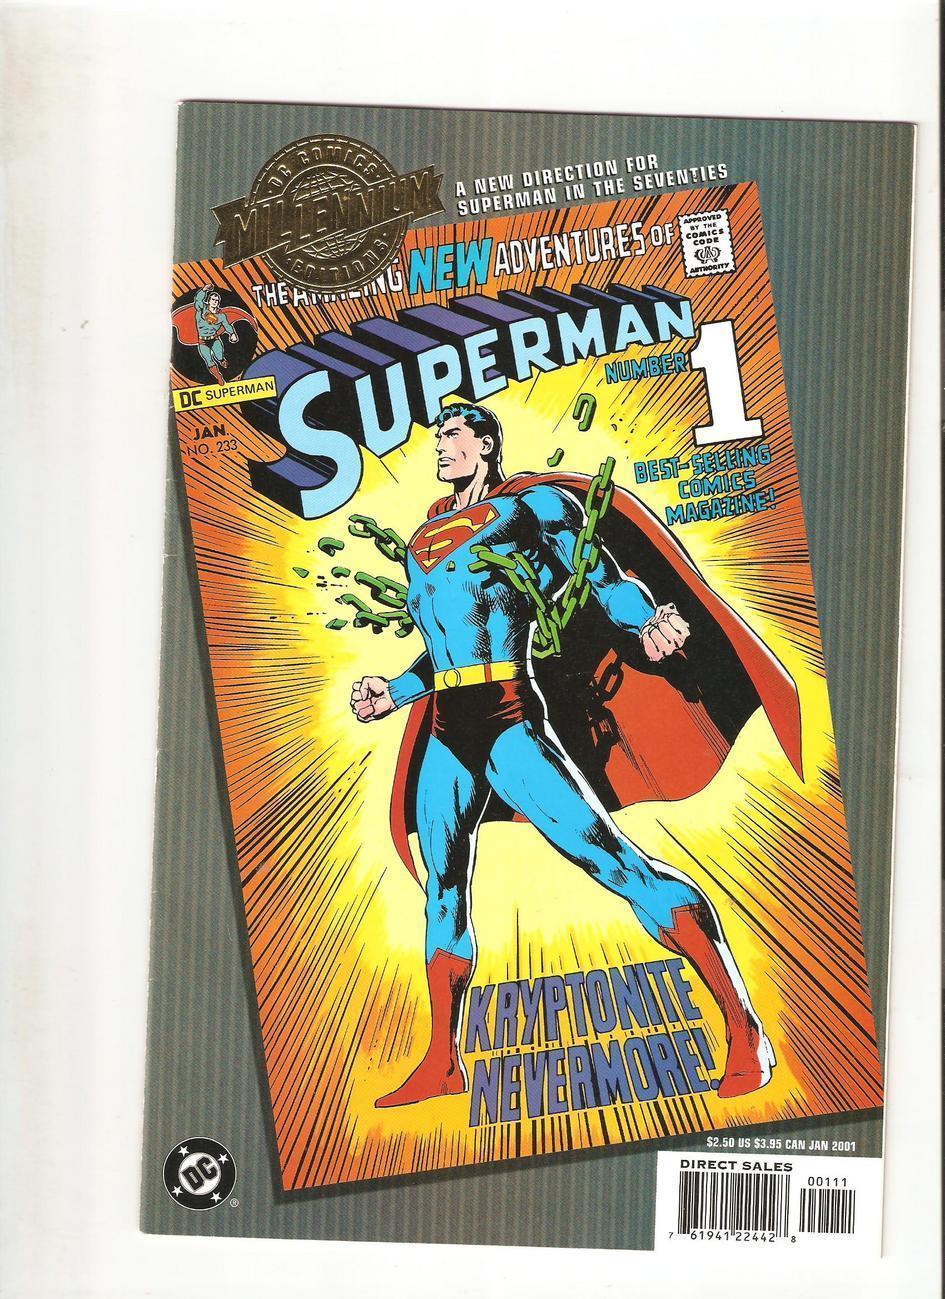 SUPERMAN ADVENTURES #44 NEAR MINT 2000 DC COMICS